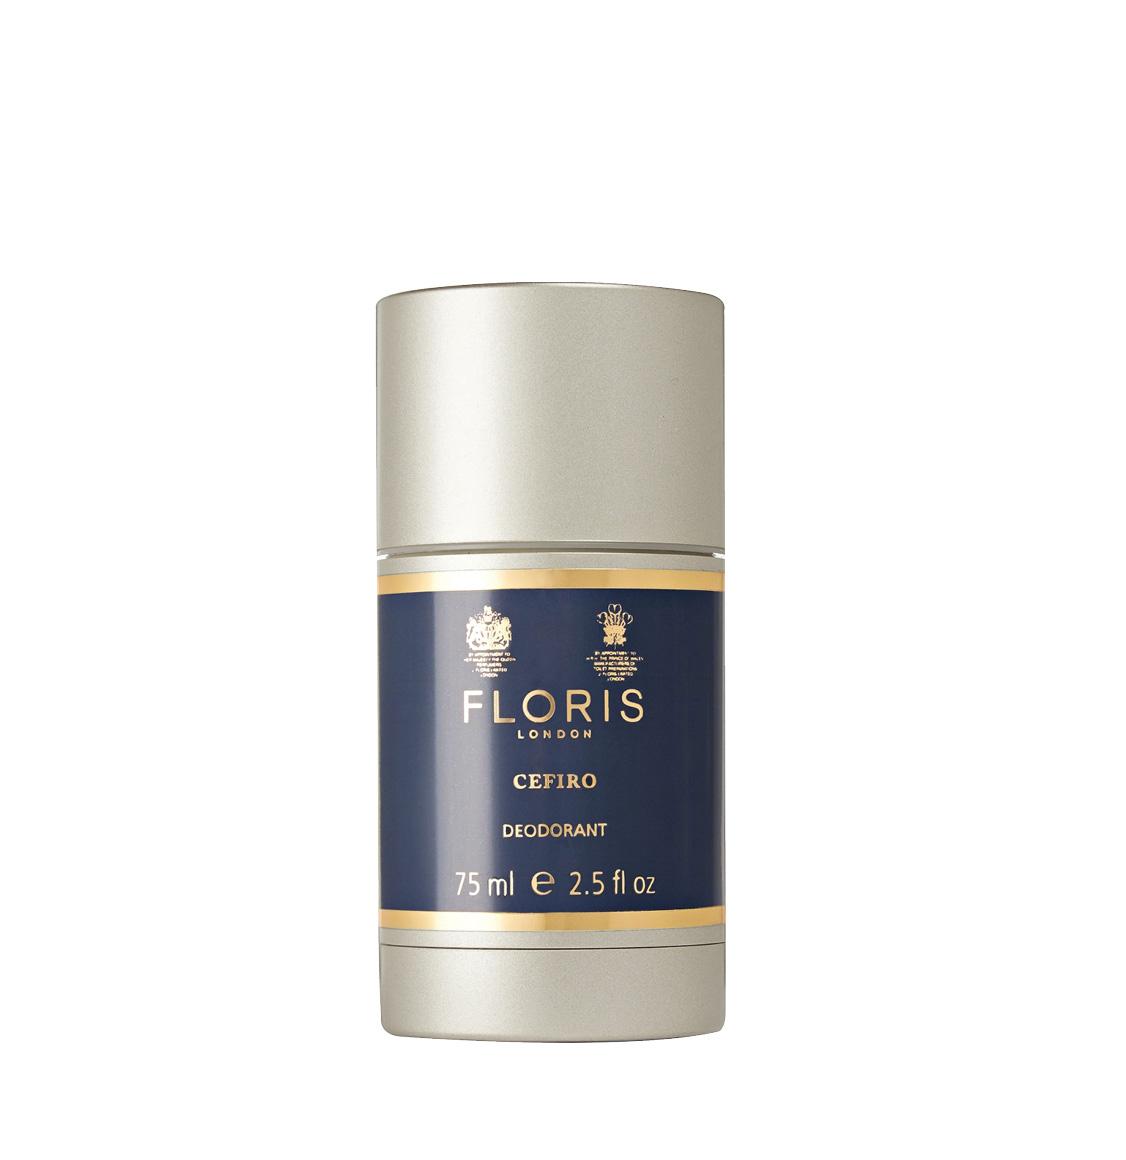 Floris London Cefiro Deodorant Stick 75ml